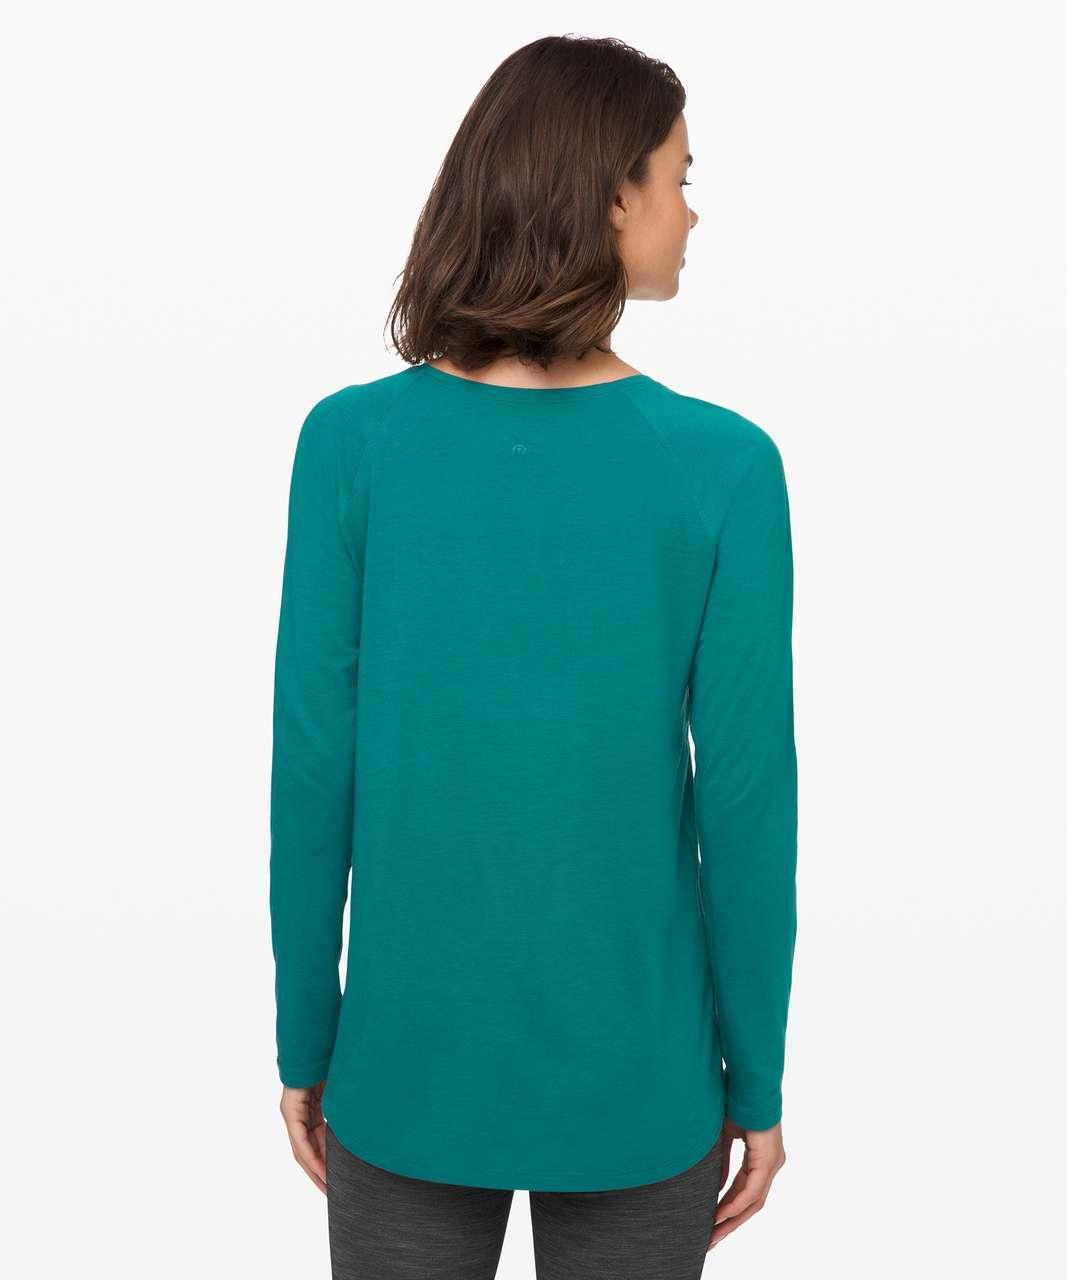 Lululemon Emerald Long Sleeve - Laguna